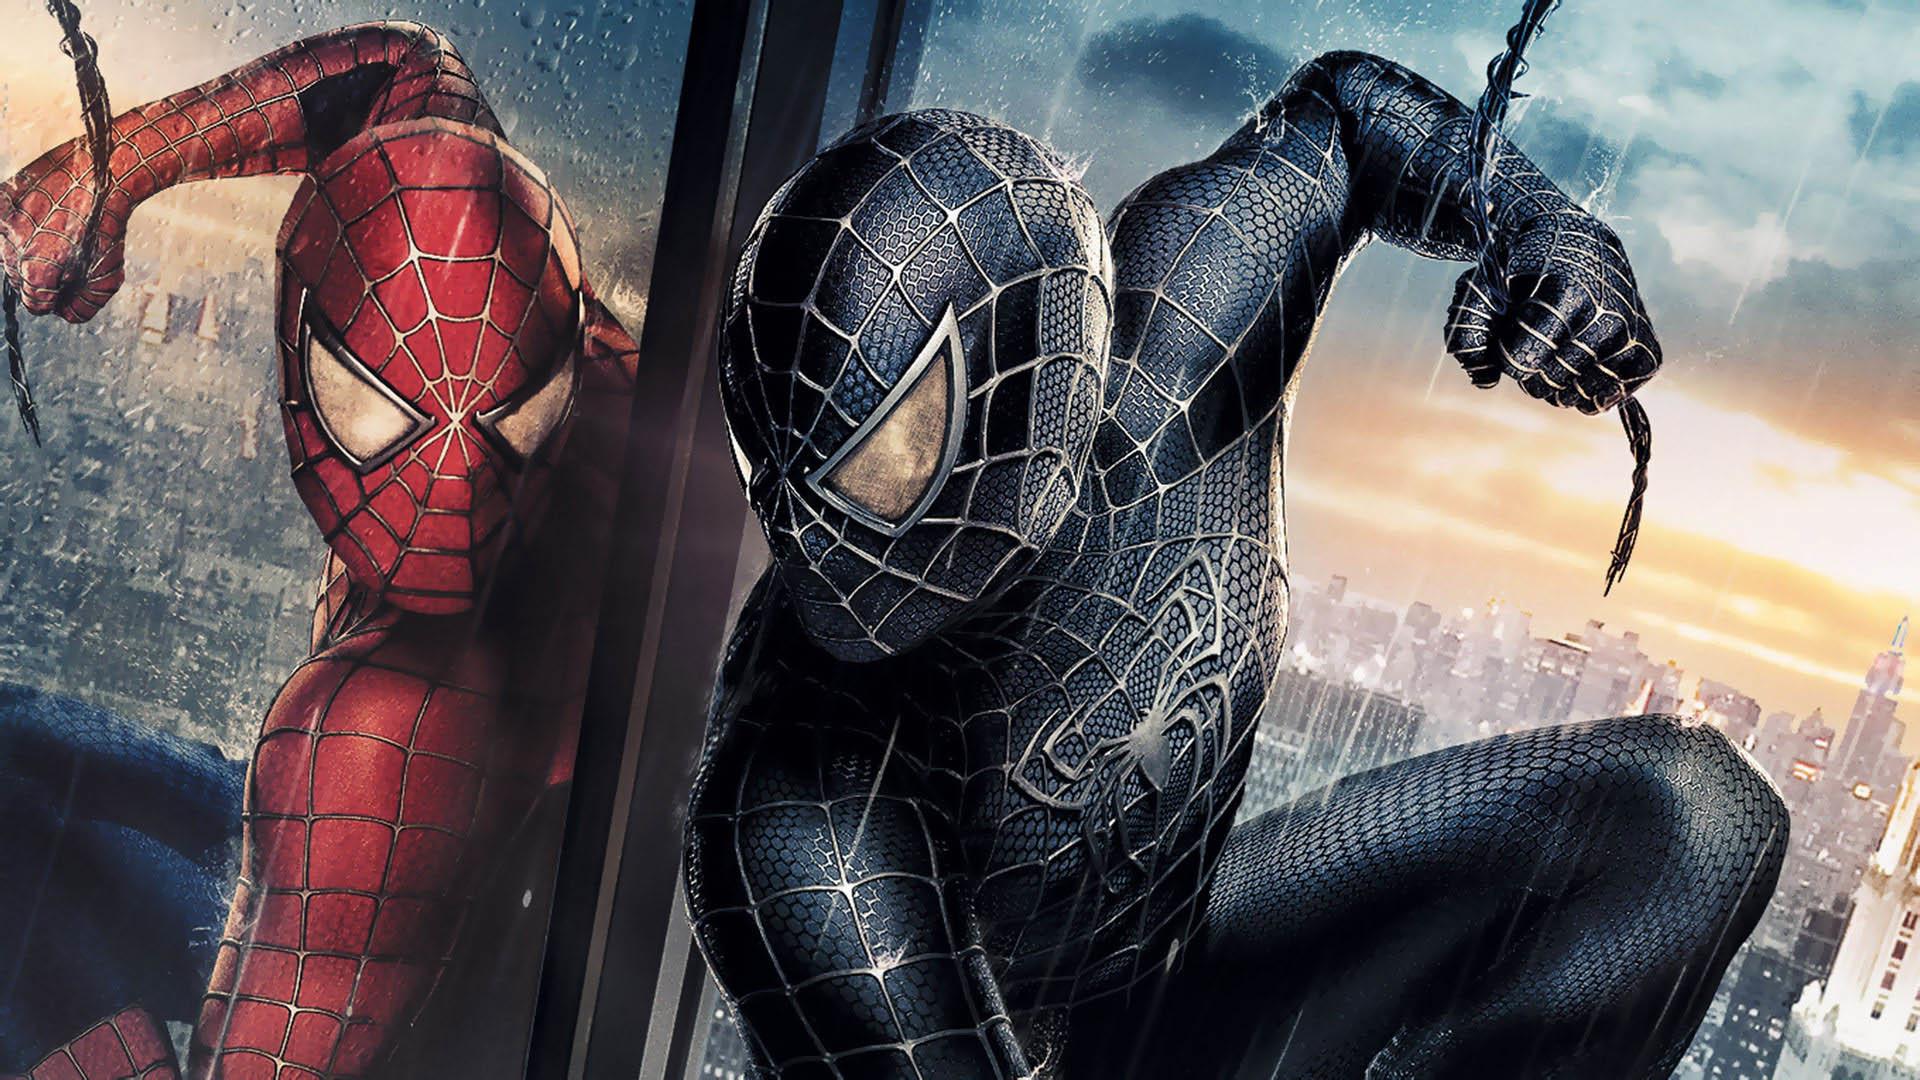 Spiderman 3 Hd Desktop Wallpaper #8431 Wallpaper   Wallpaper hd